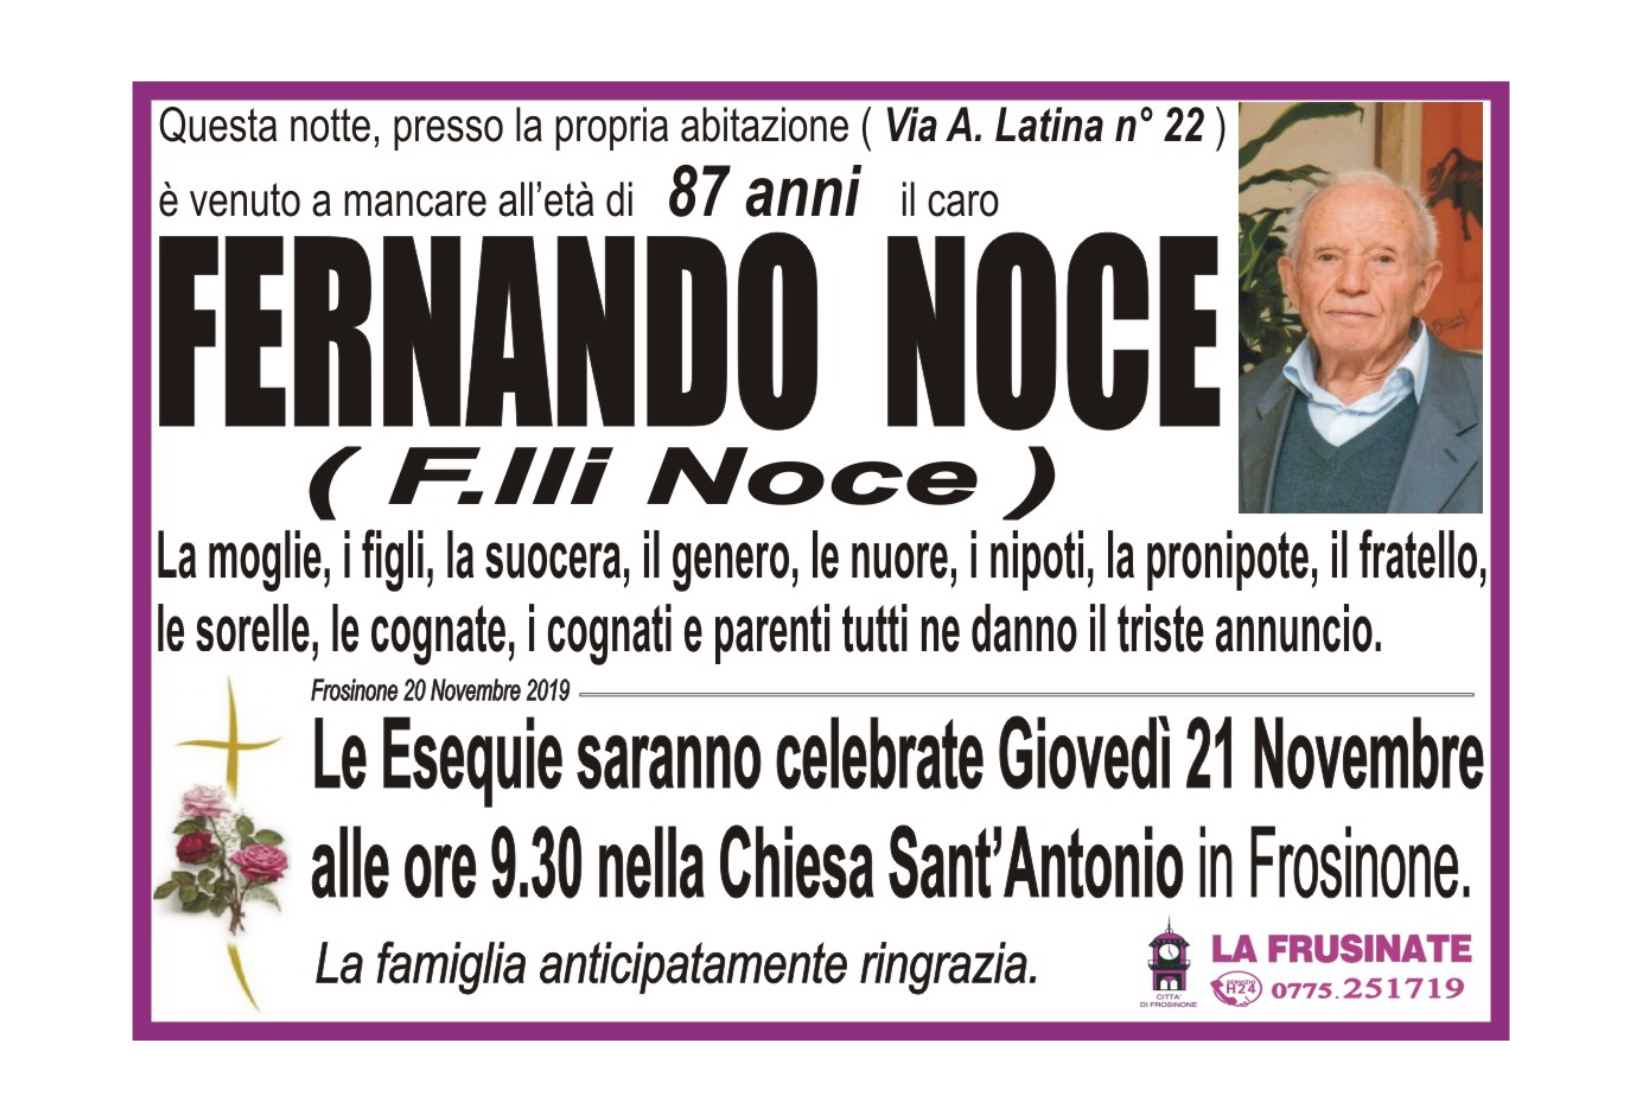 Fernando Noce